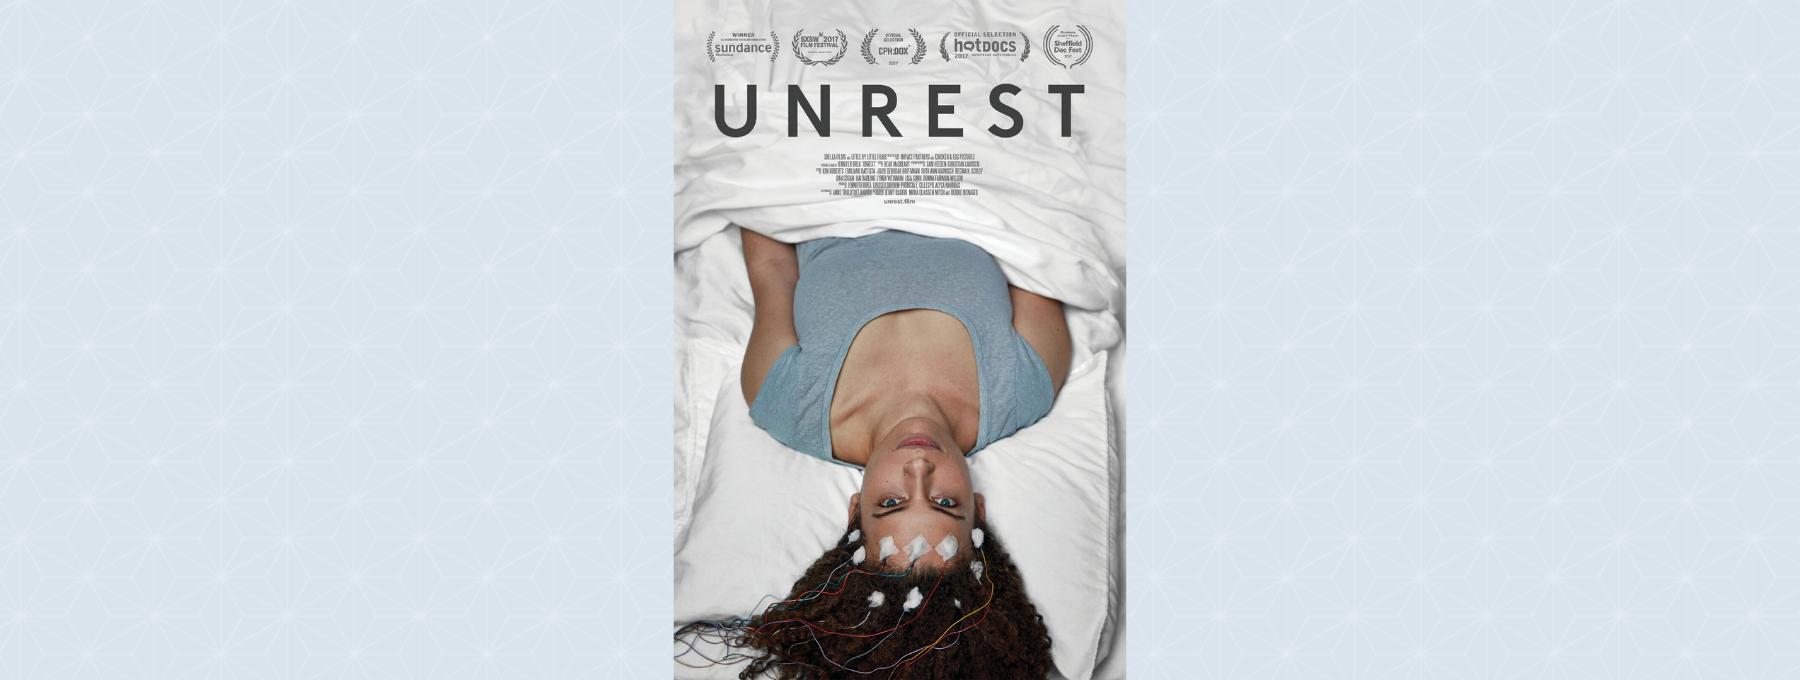 P/C Unrest documentary 1800 x 680